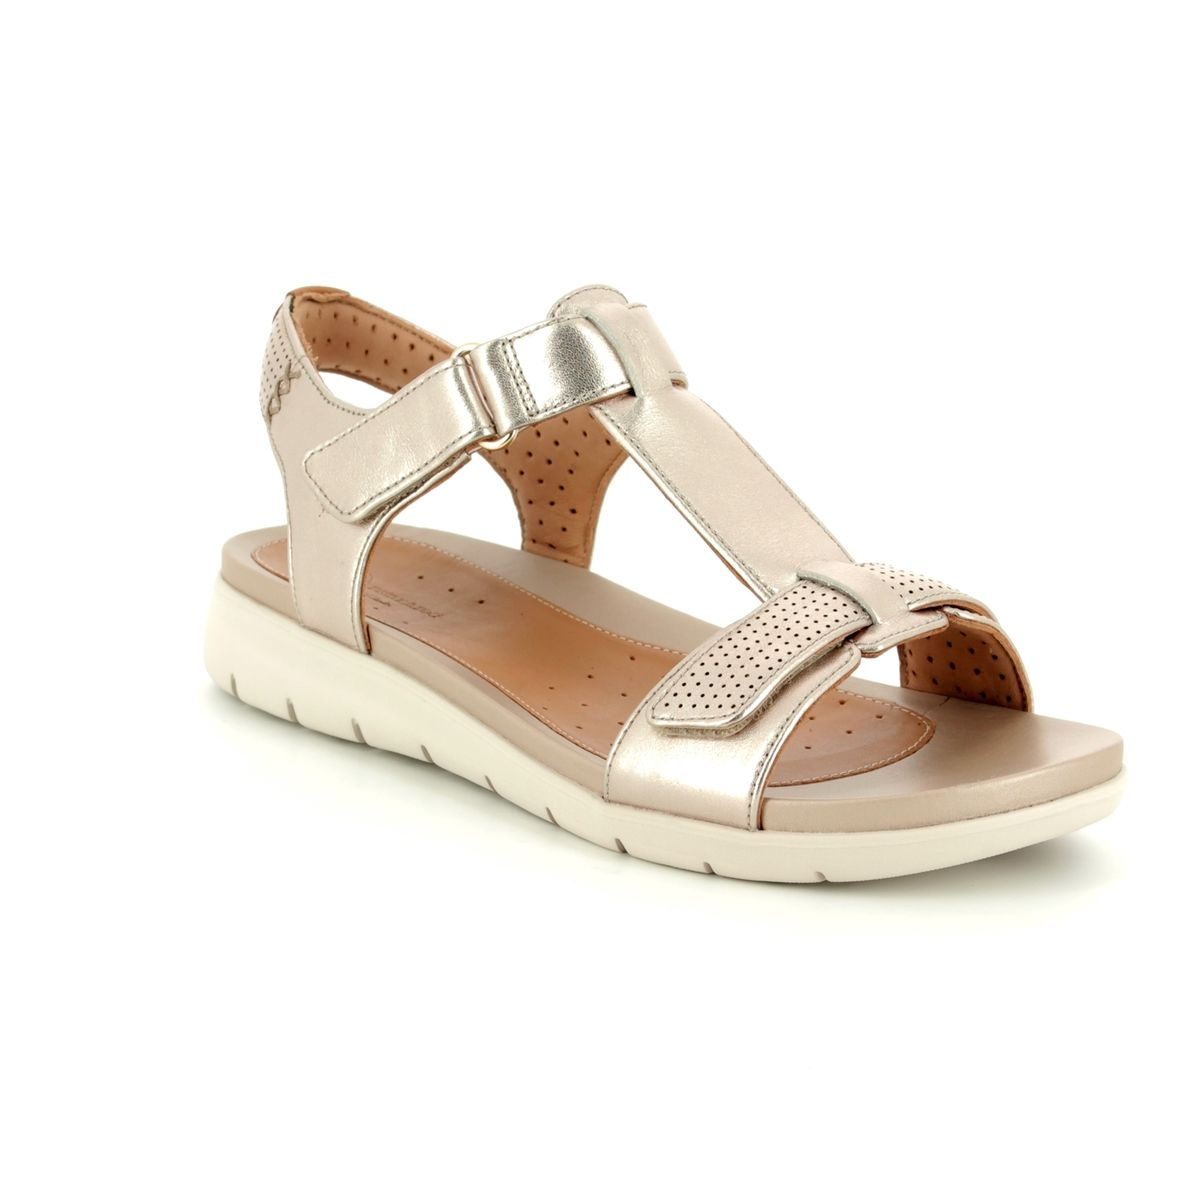 937ccaf05aa3 Clarks Sandals - Gold - 3330 74D UN HAYWOOD